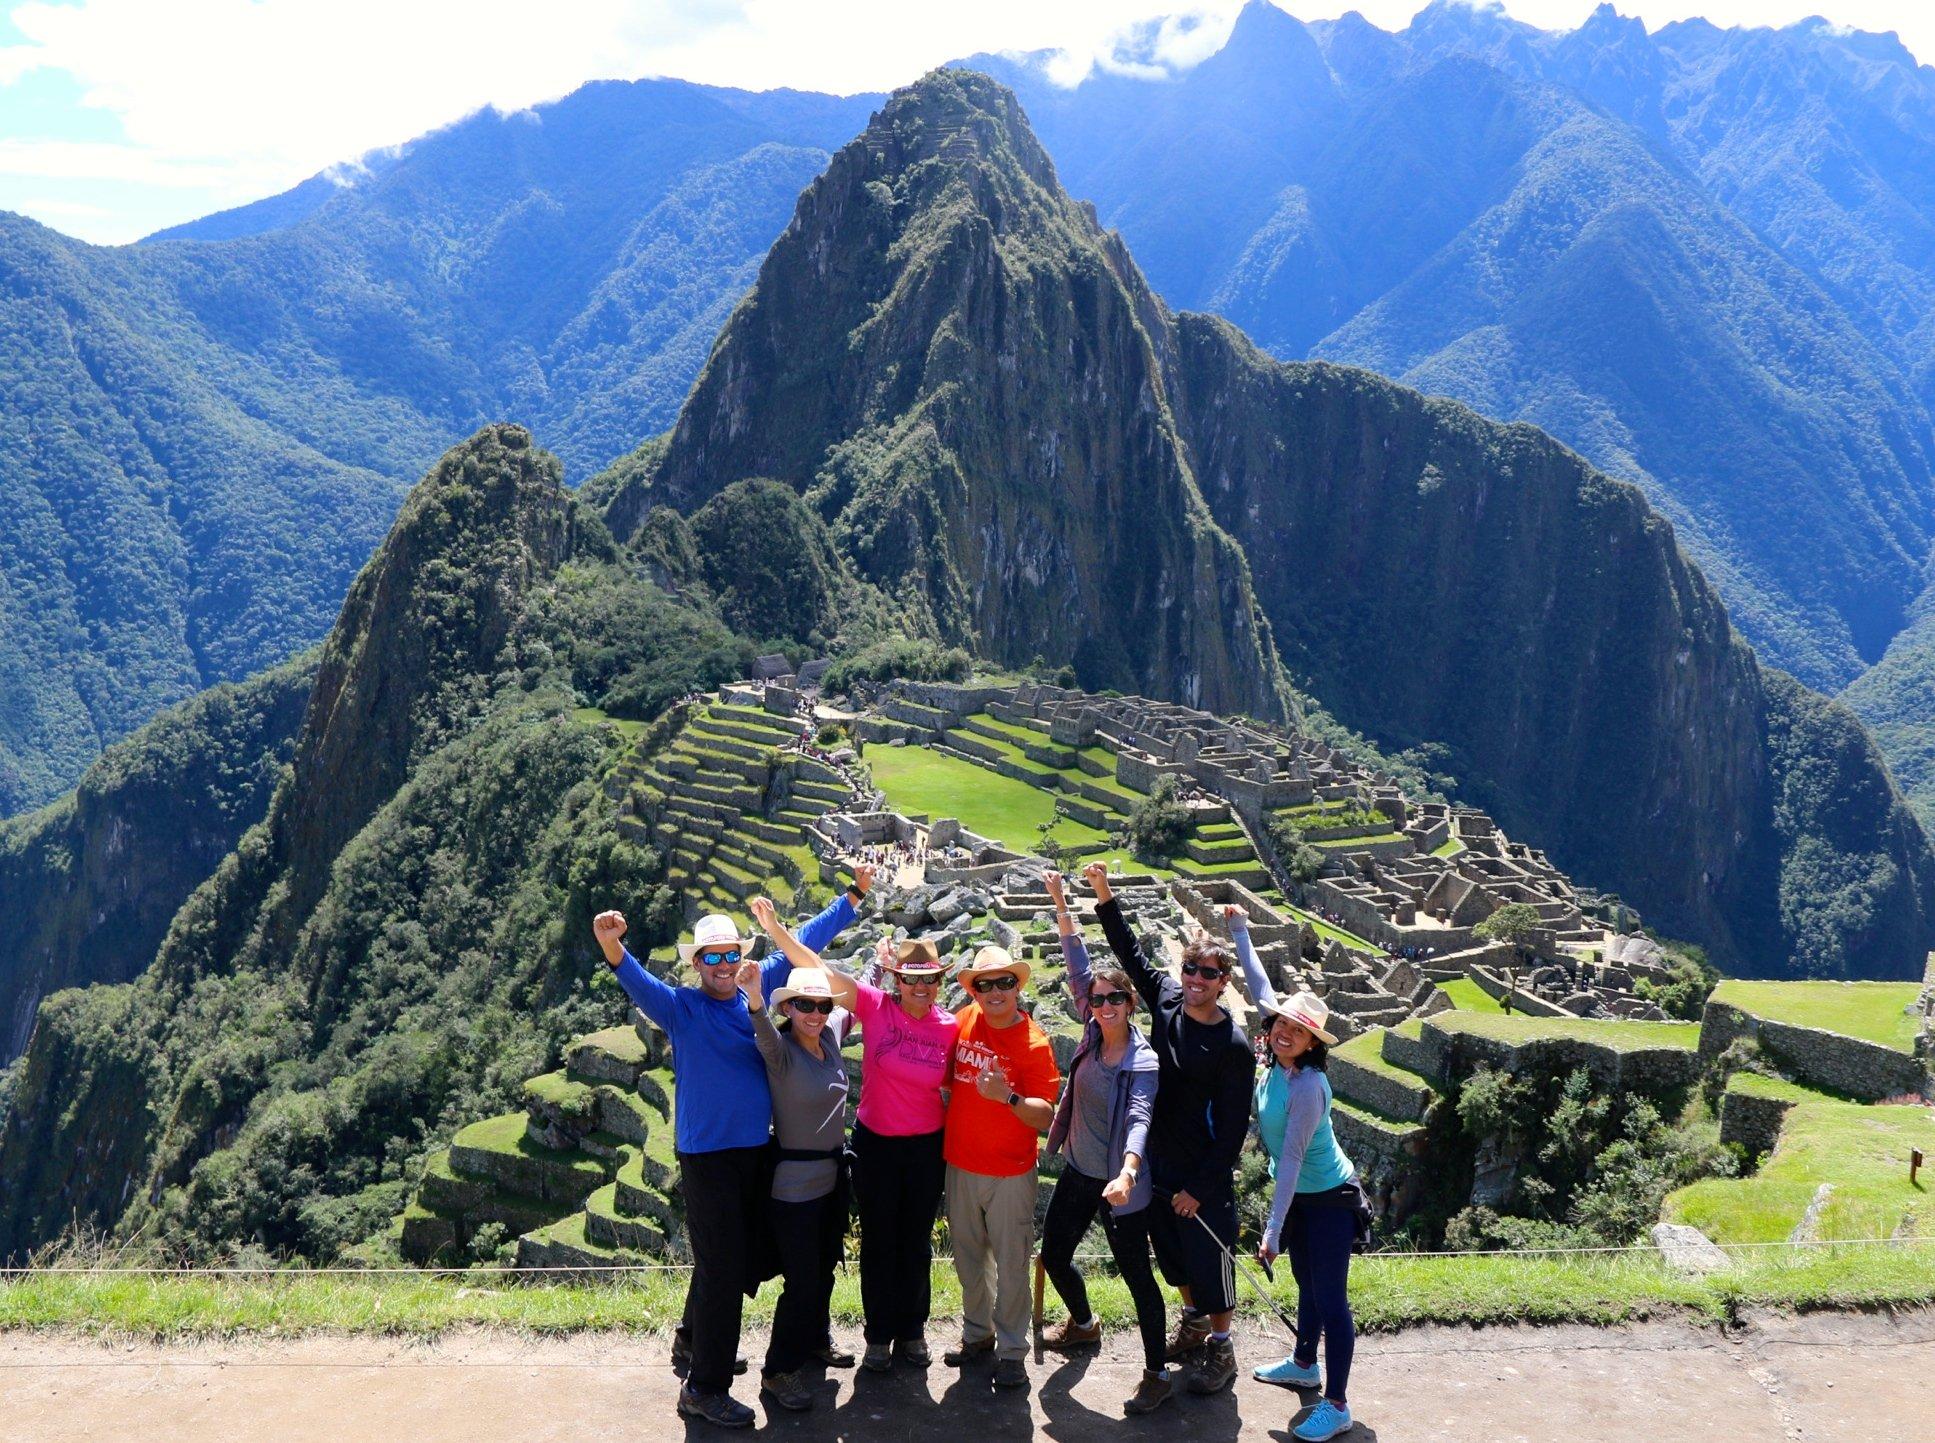 Explore the amazon jungle peru trip advisors - All Photos 49